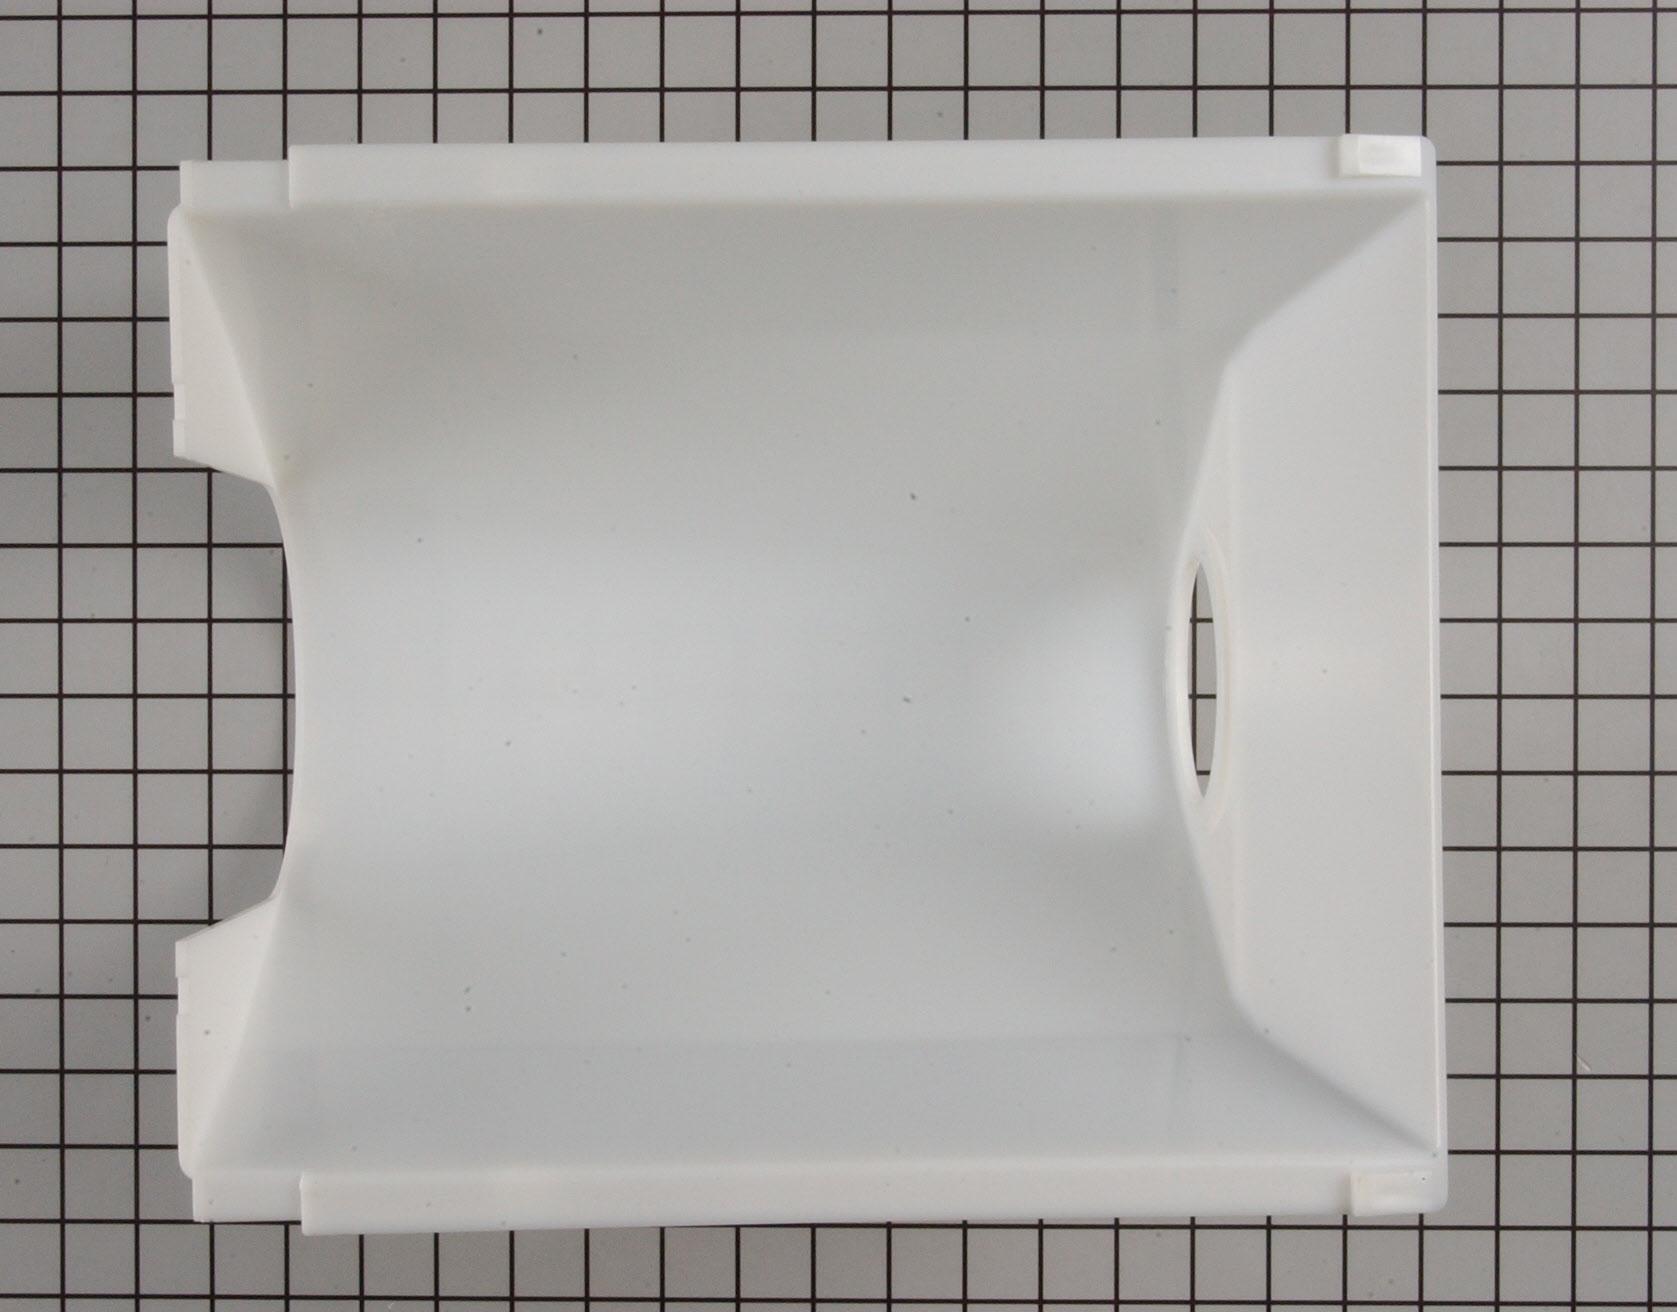 WP67005959 Gaggenau Refrigerator Part -Ice Bucket